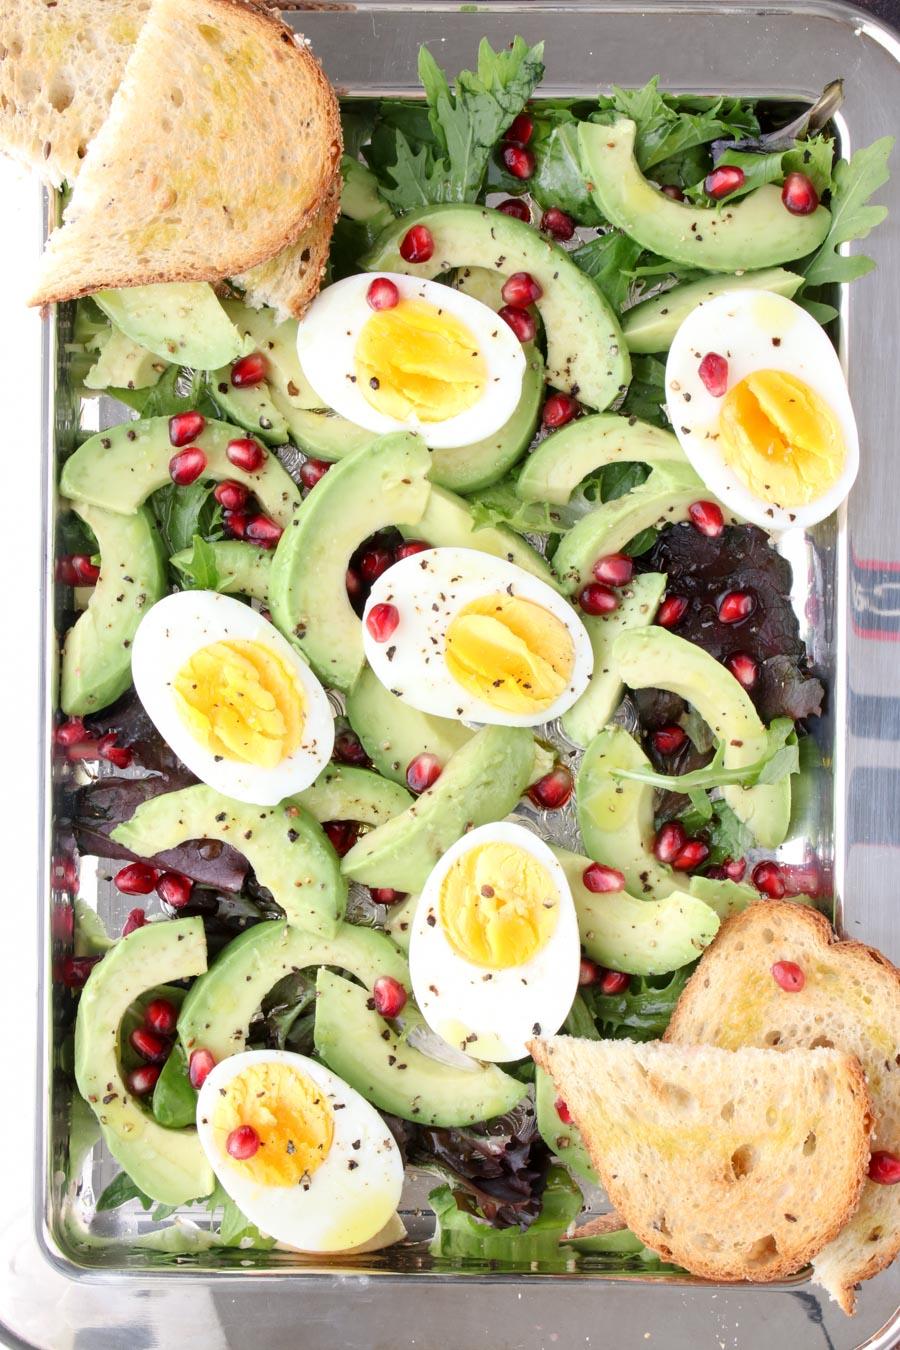 Photo showing the assembled avocado egg brunch platter